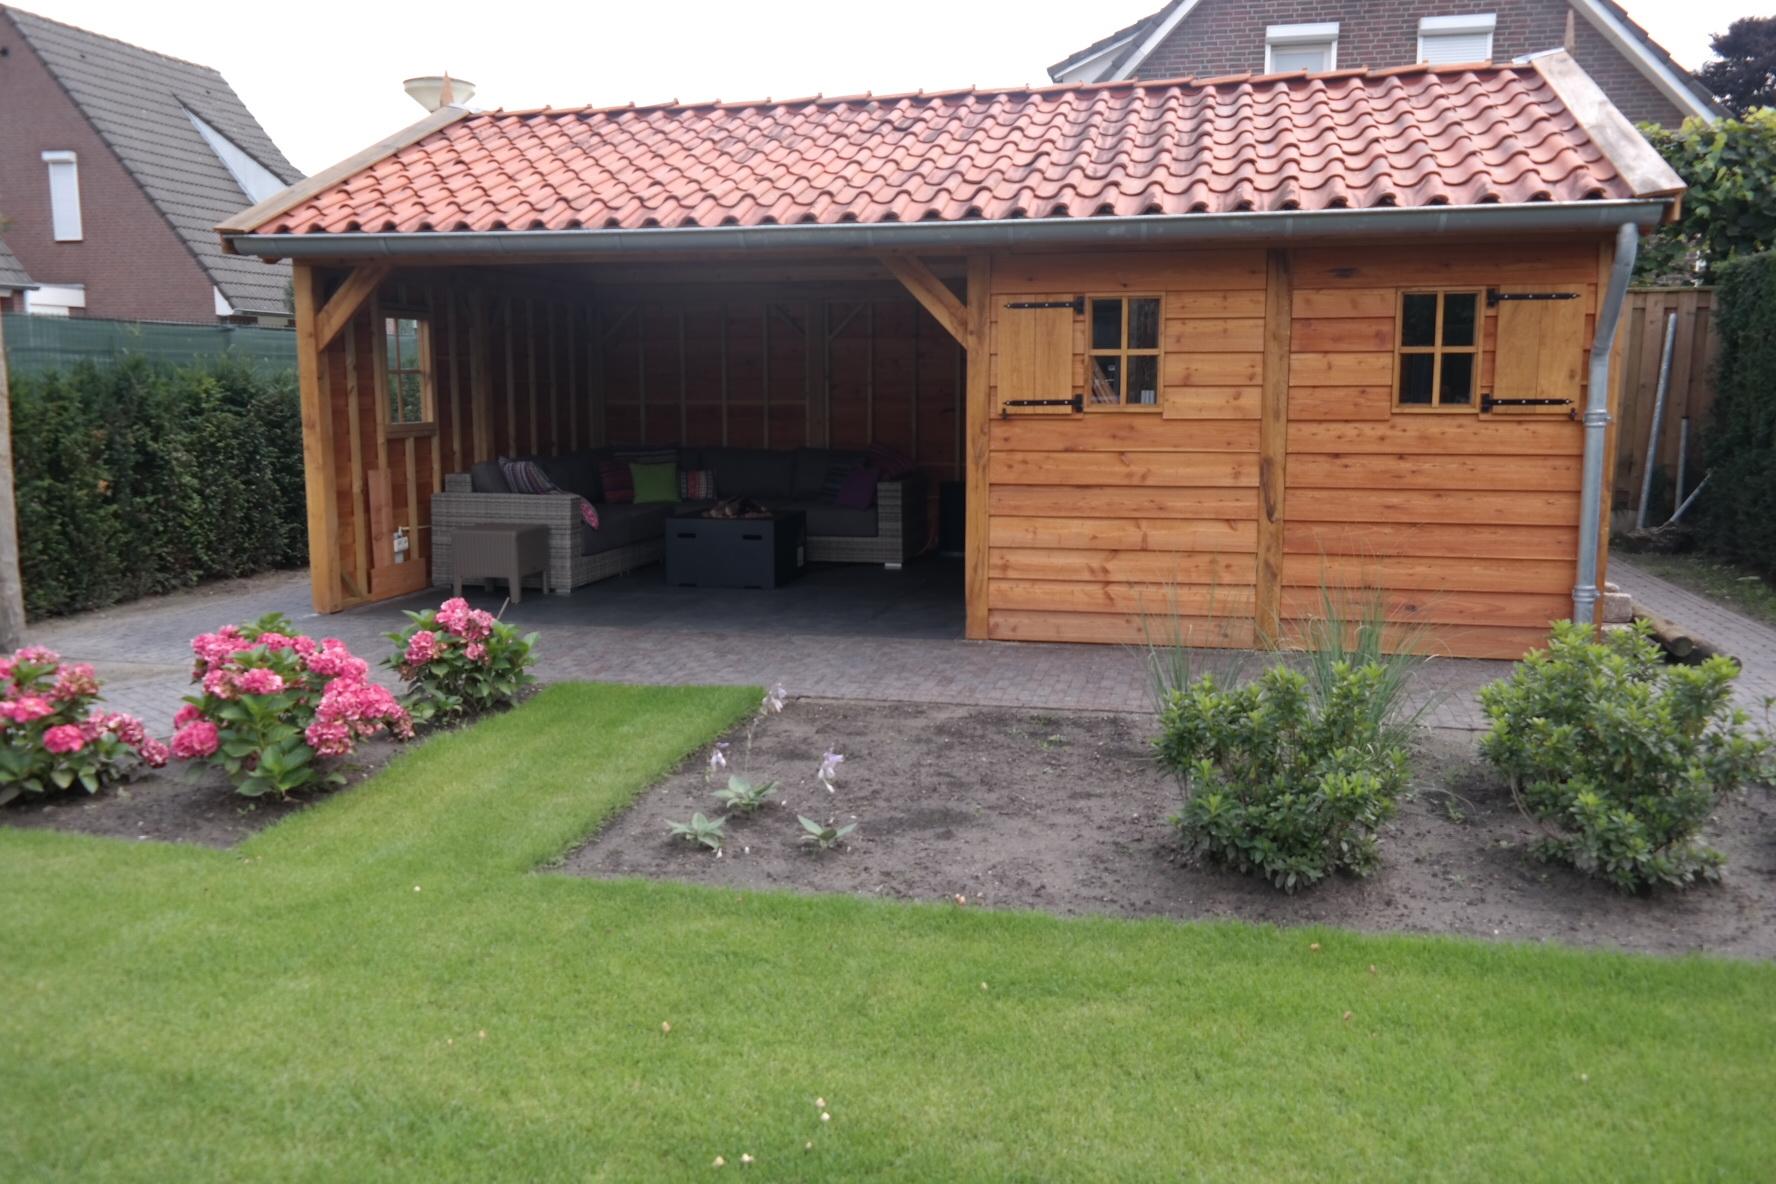 eikenhouten_veranda - Foto impressie eikenhouten bijgebouw opgeleverd in Limburg (NL).